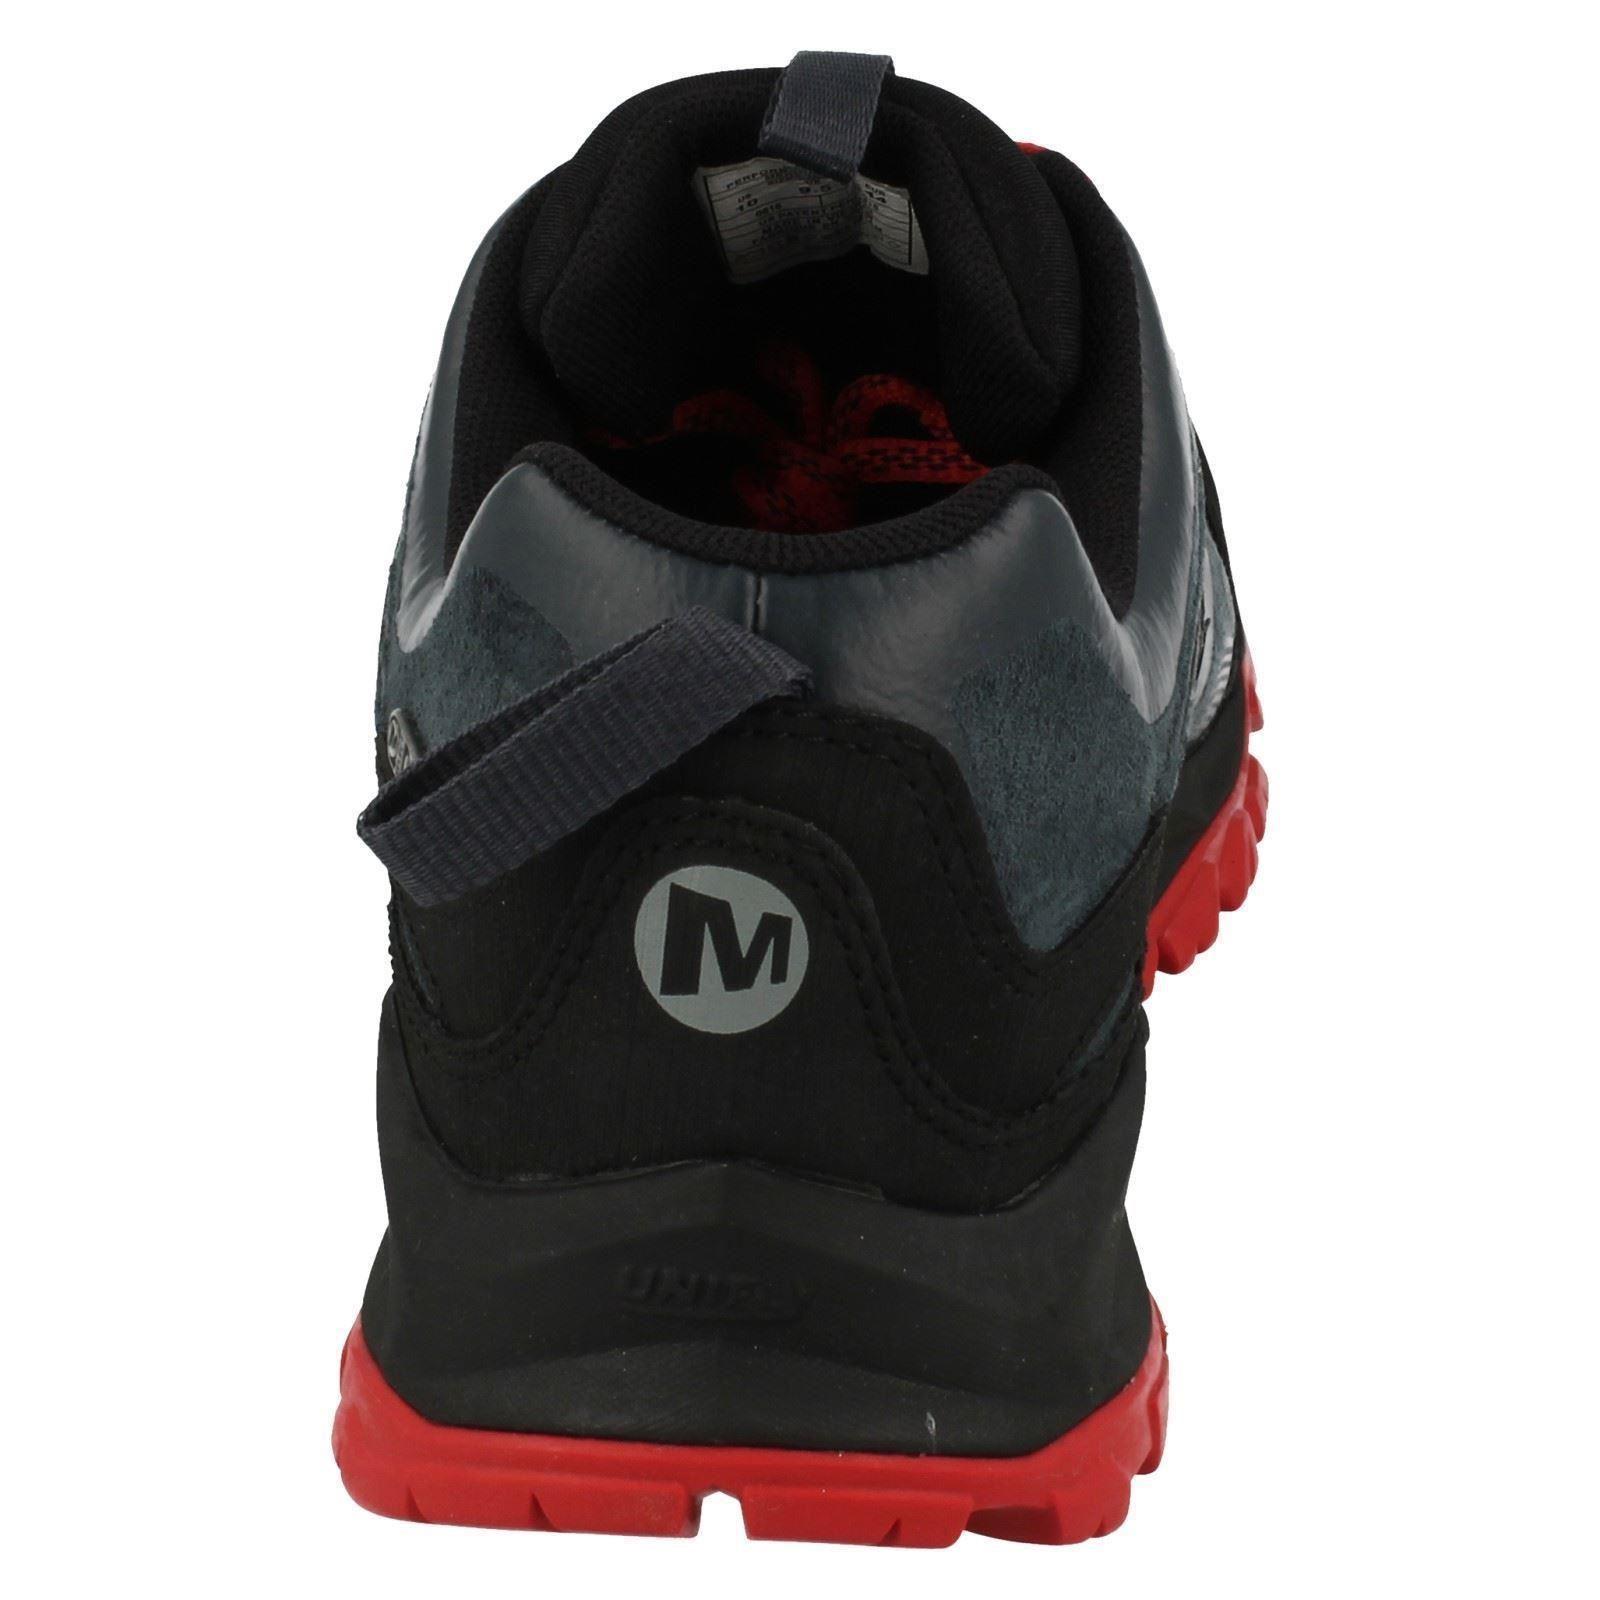 Mens Merrrell Trainers Capra Bolt Leather WTPF